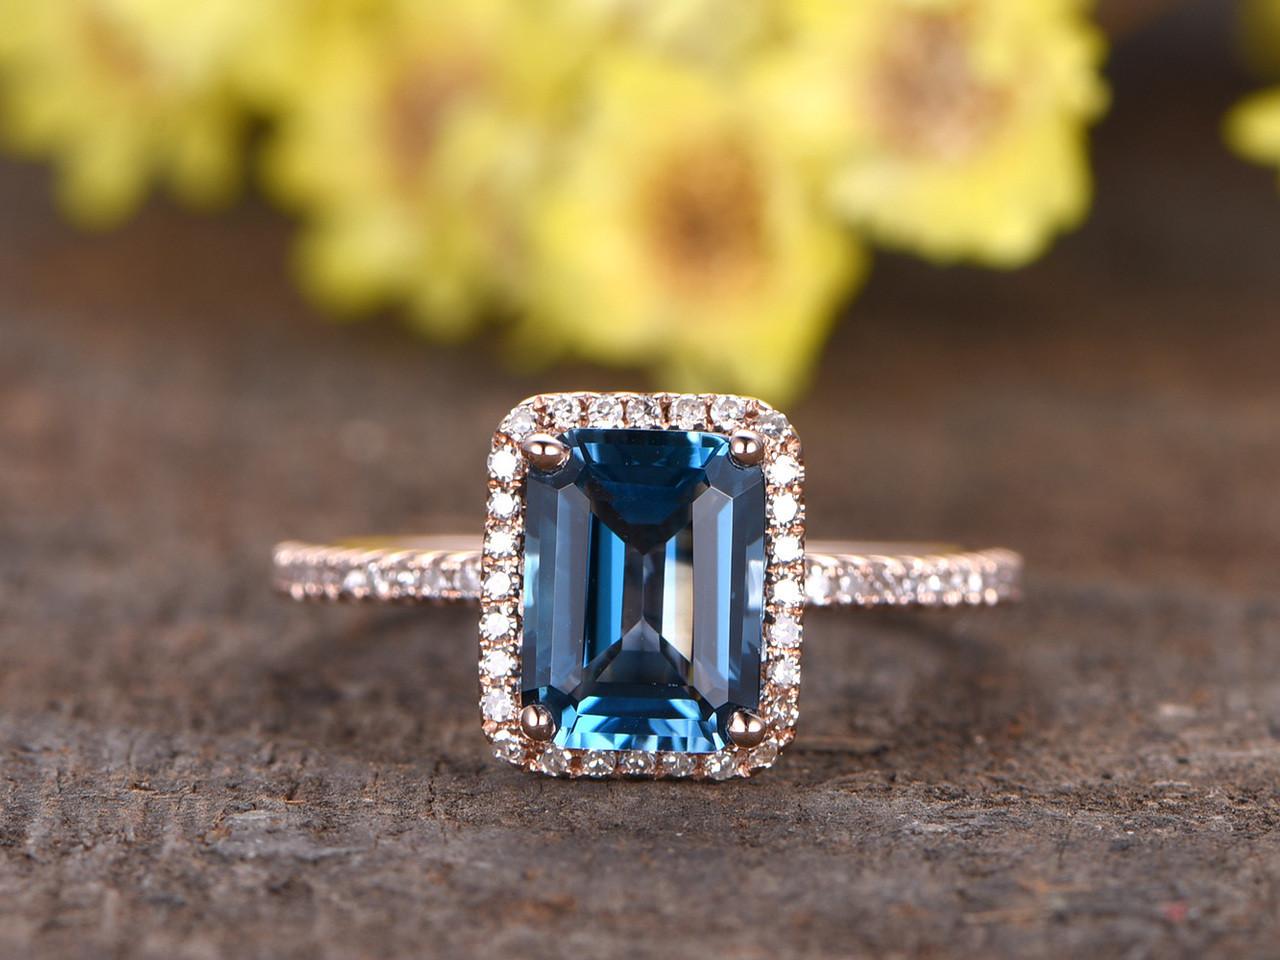 New 1.4ct Emerald Cut London Blue Topaz Engagement Ring With Diamond  OQ46